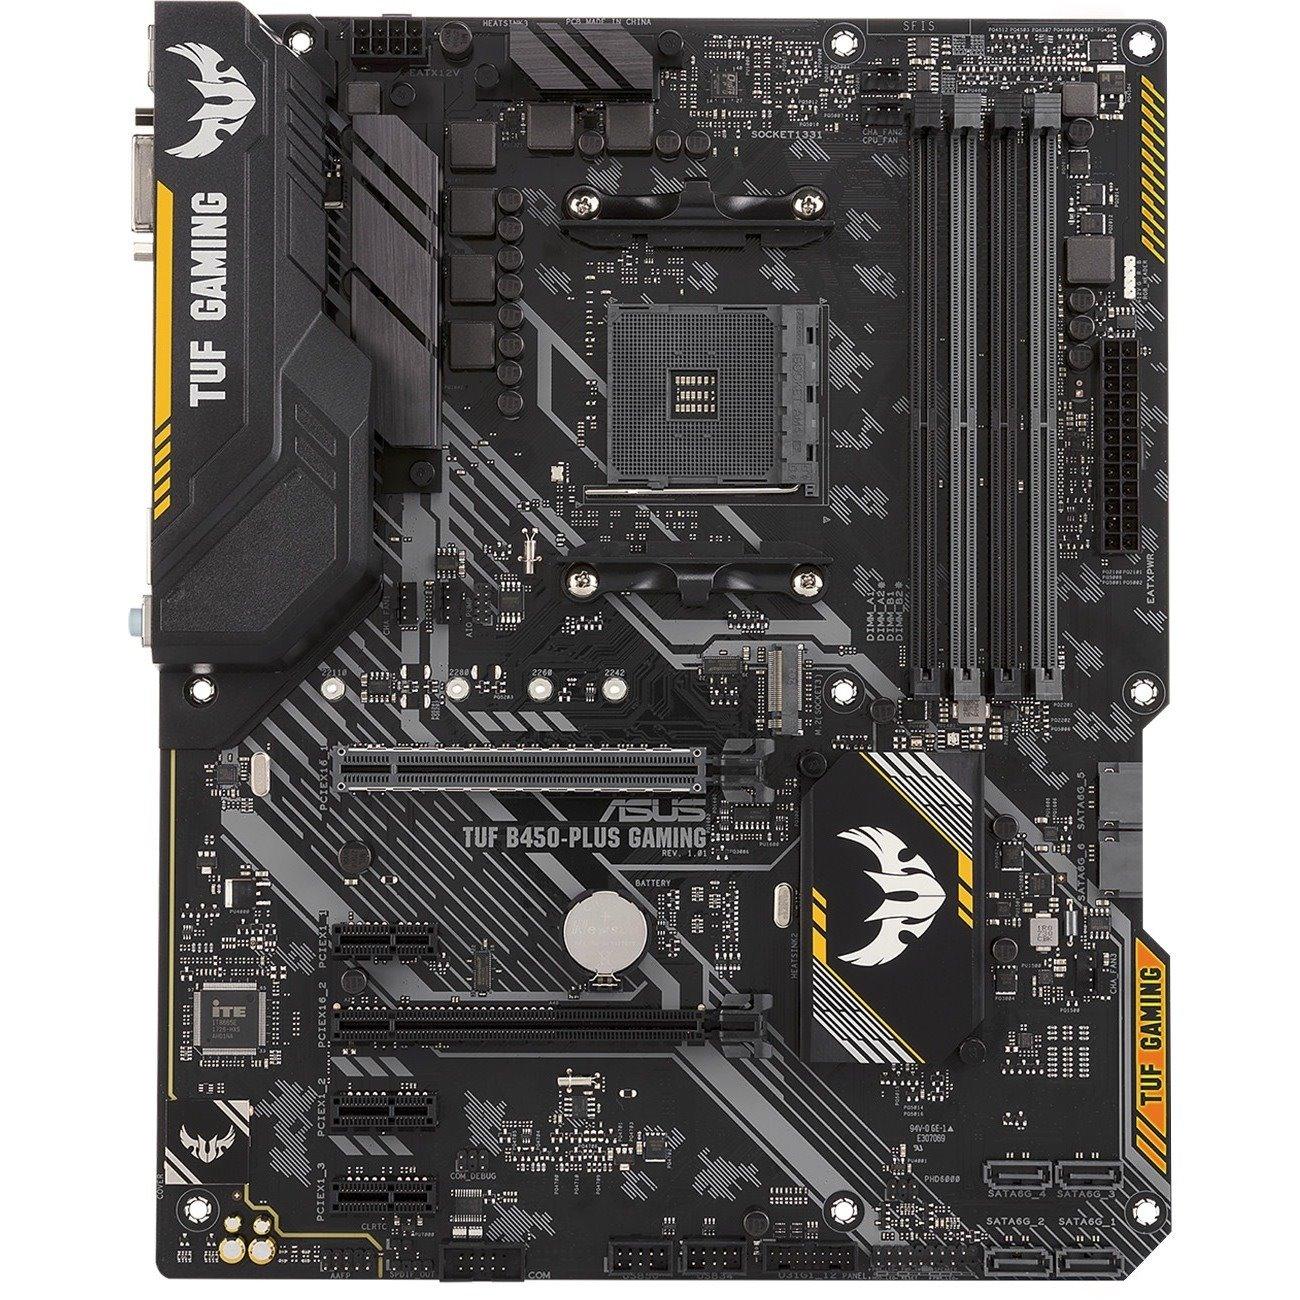 Buy TUF B450-PLUS GAMING Desktop Motherboard - AMD Chipset - Socket